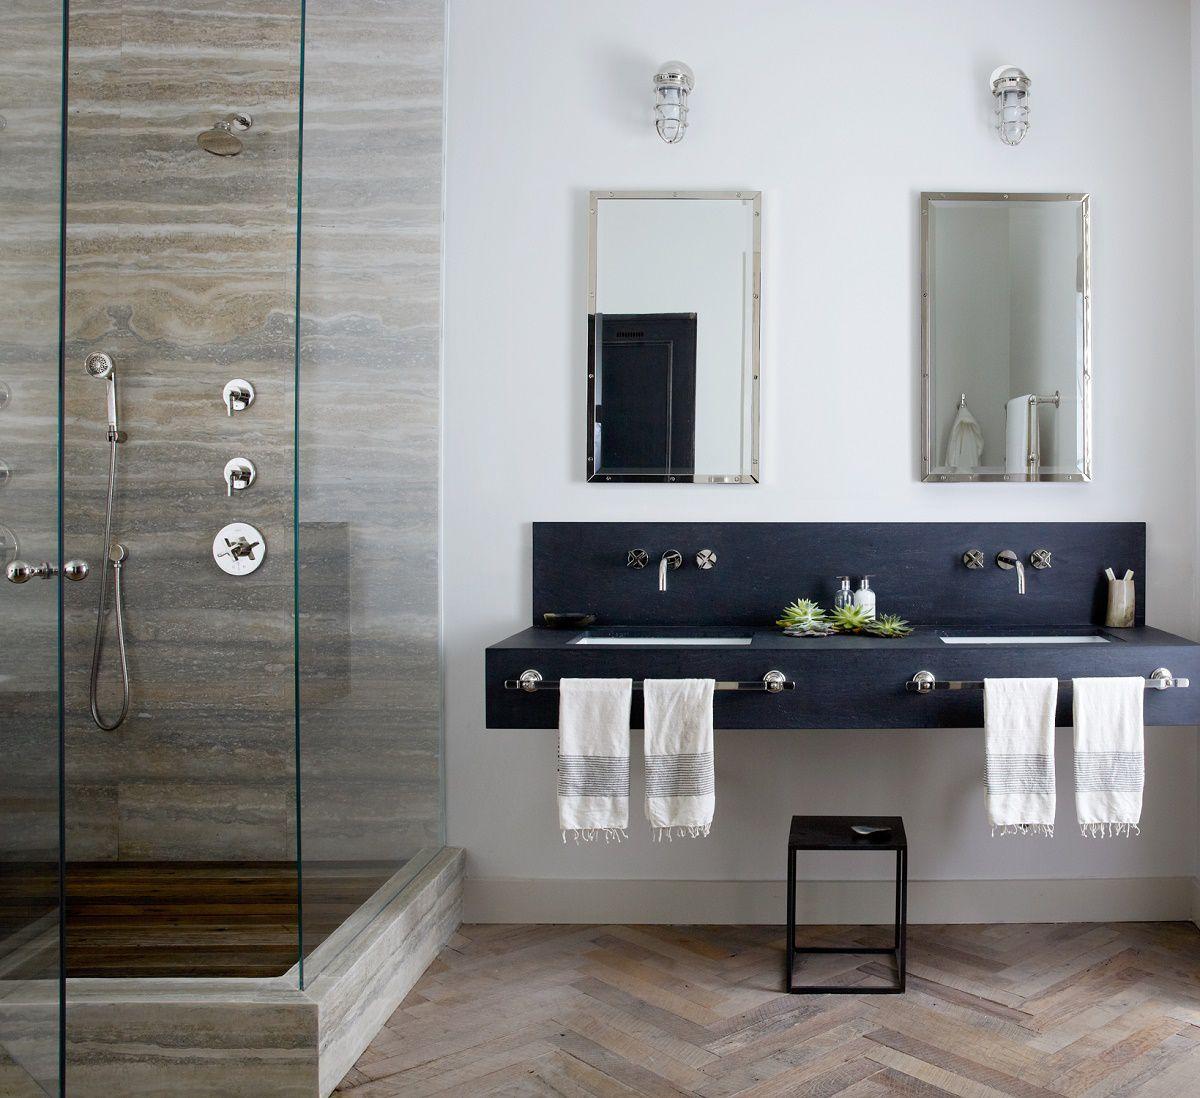 Noho loft-jenny wolf-master bathroom